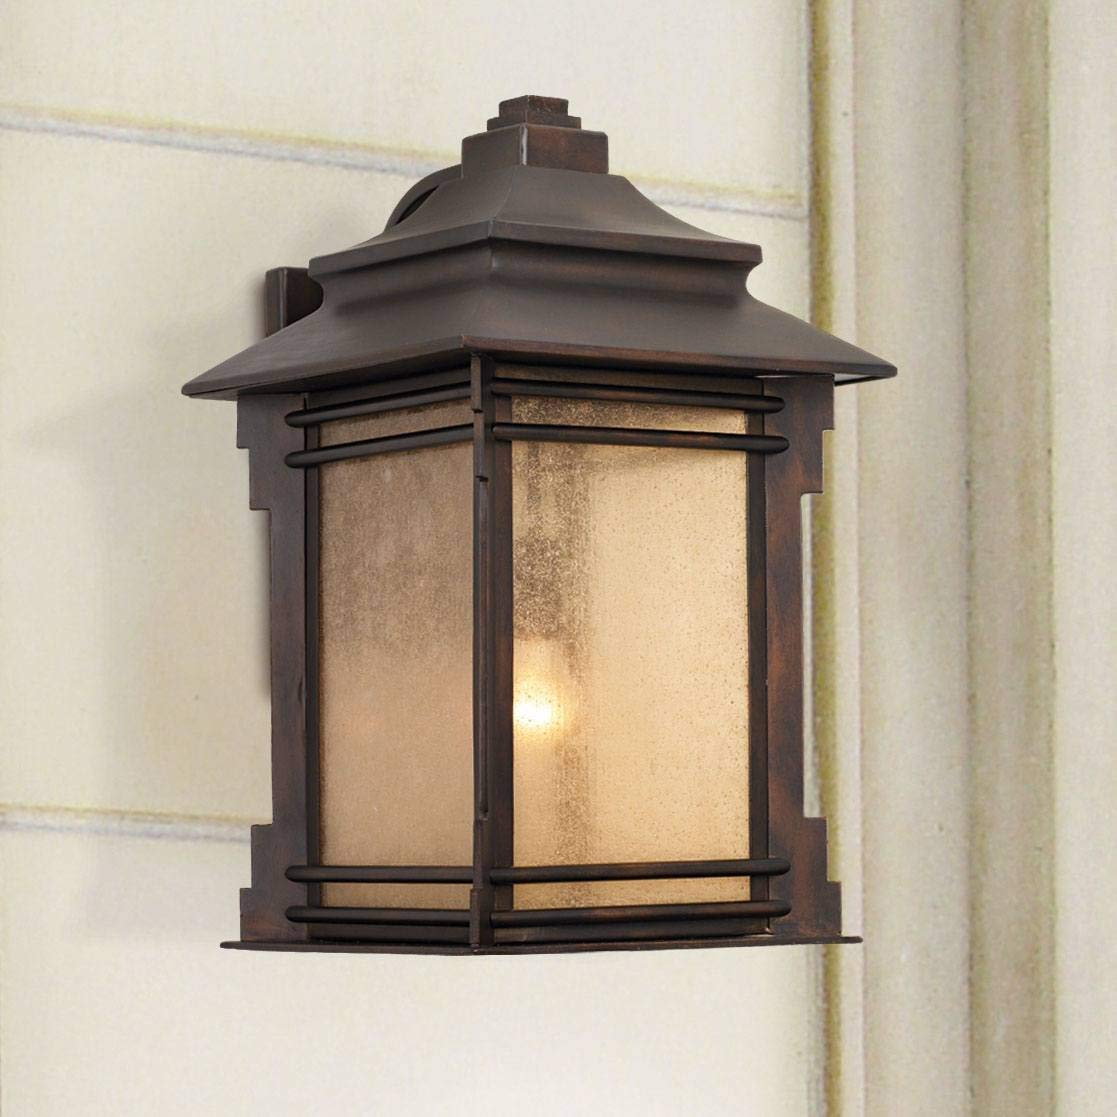 "Hickory Point Rustic Farmhouse Outdoor Wall Light Fixture Walnut Bronze Iron 16"" Cream Glass for Exterior Patio Porch House"